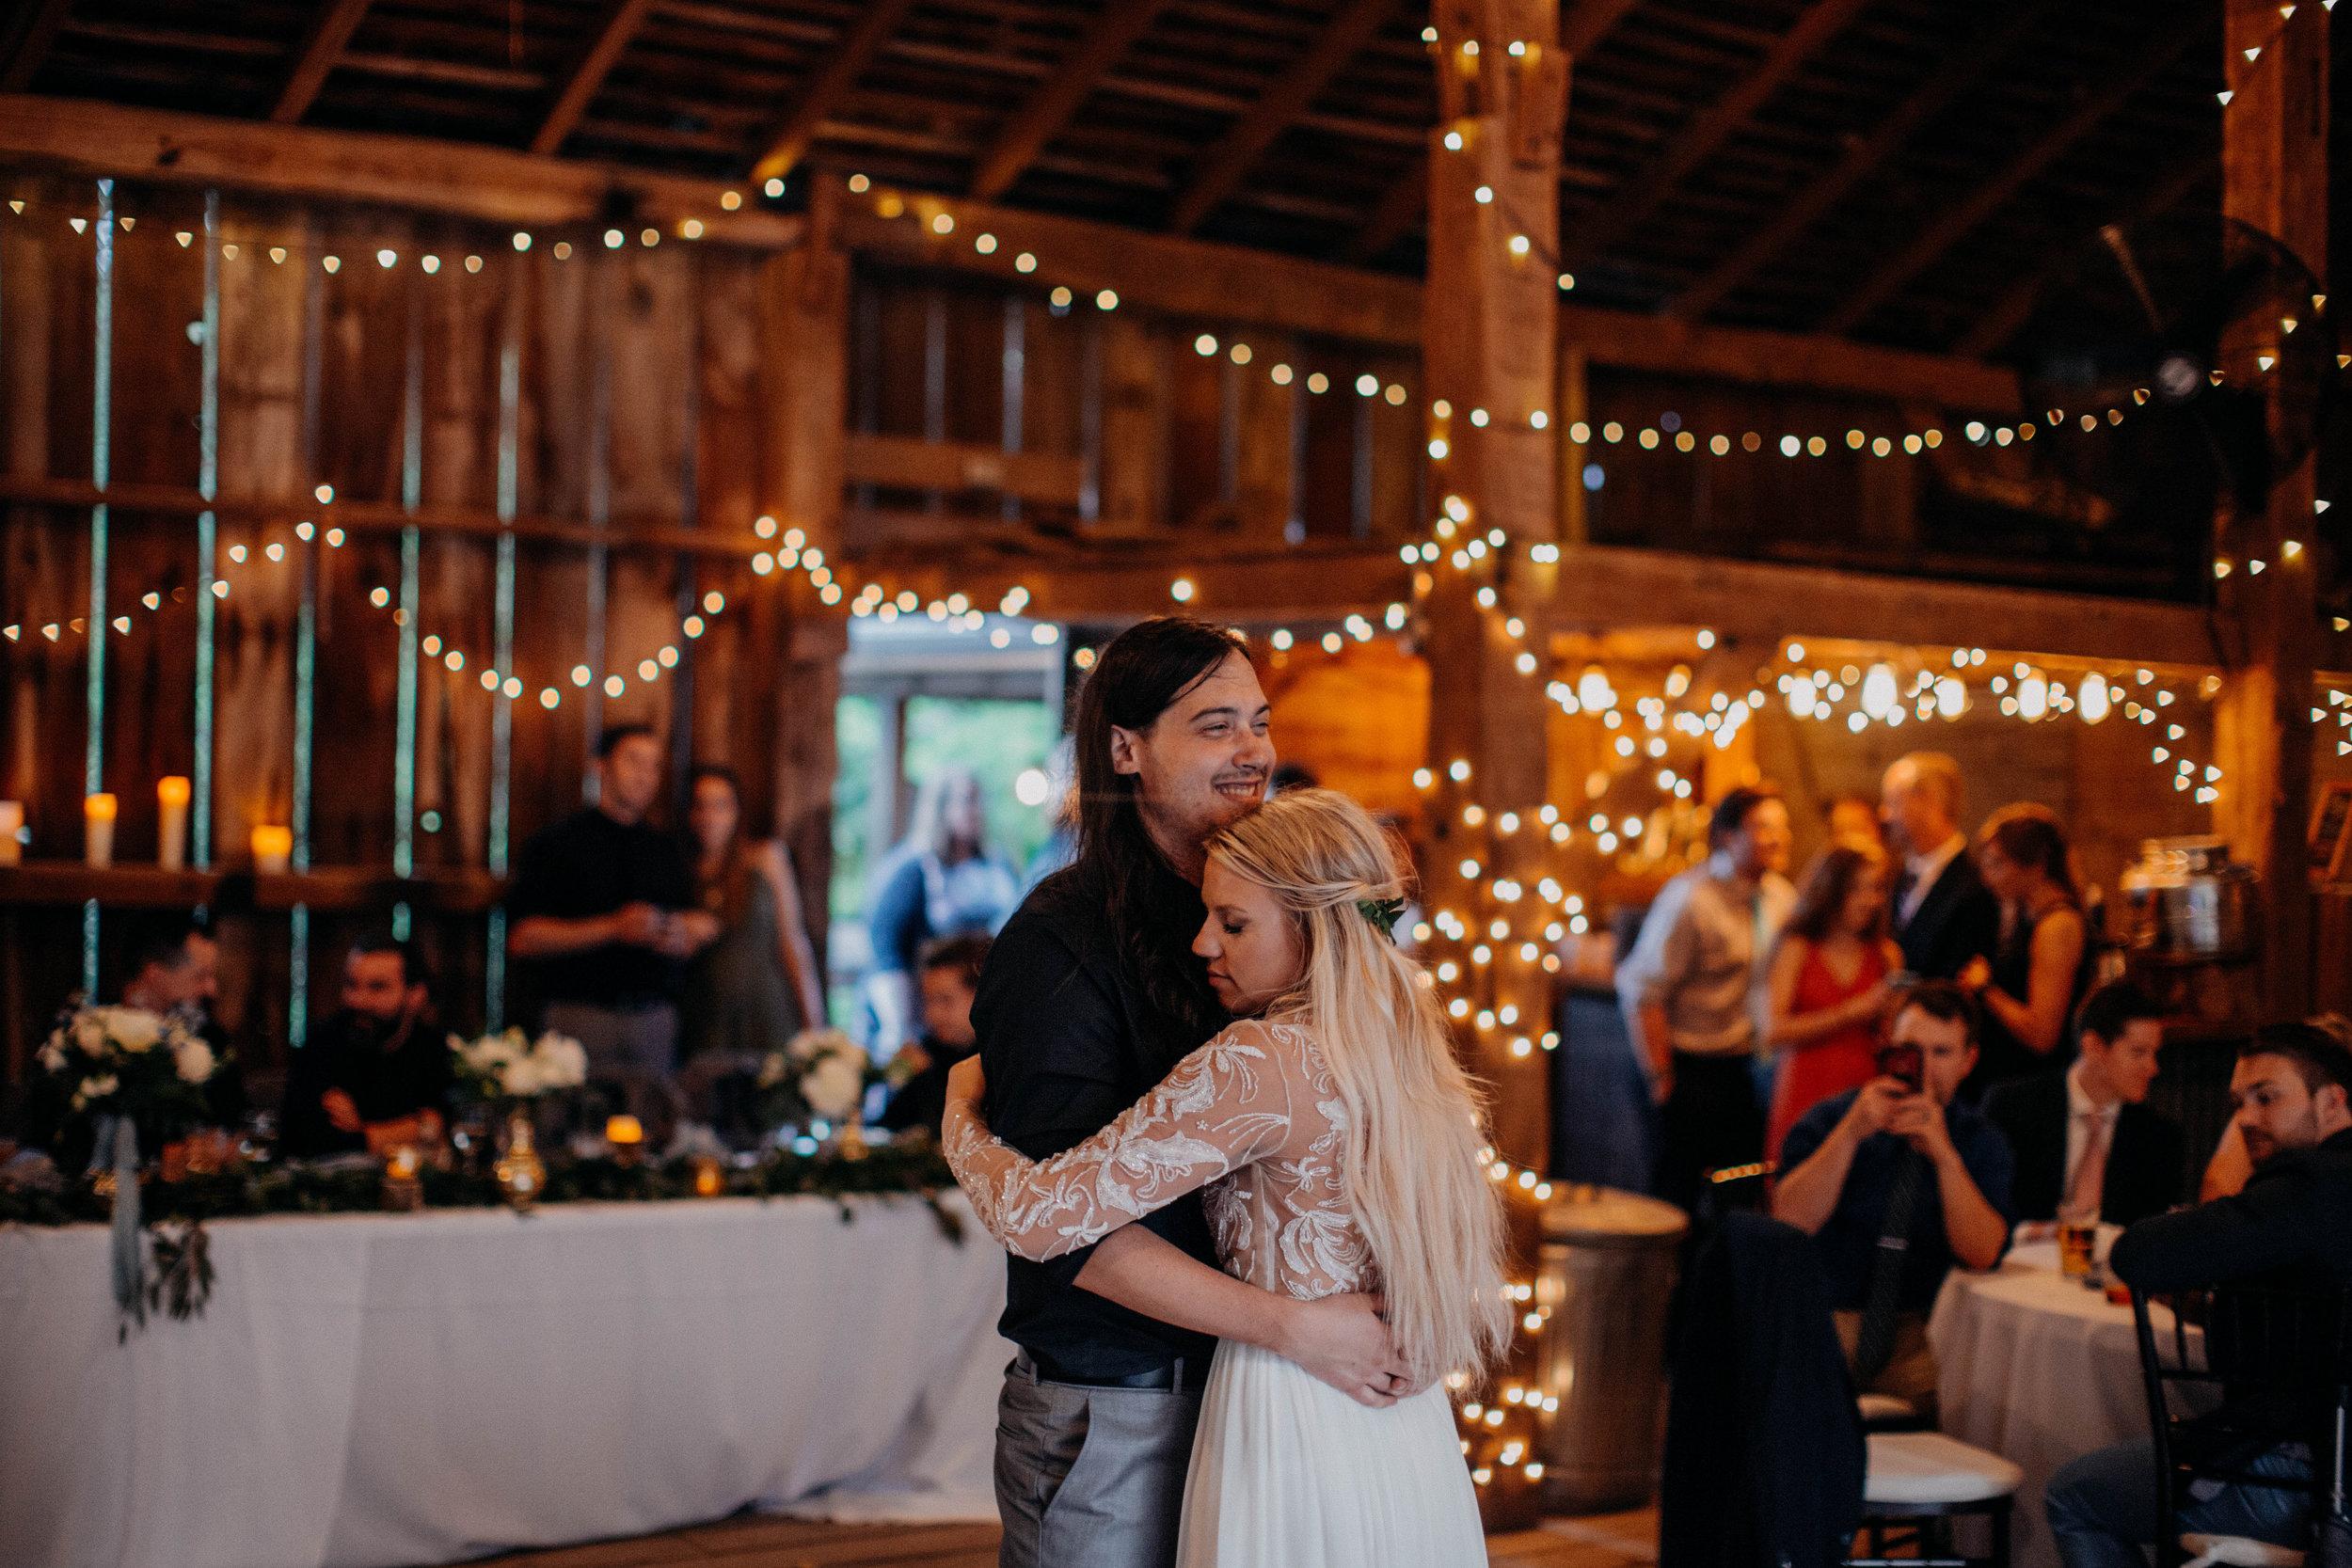 Columbus ohio wedding photographer canyon run ranch wedding grace e jones photography wedding photographer235.jpg